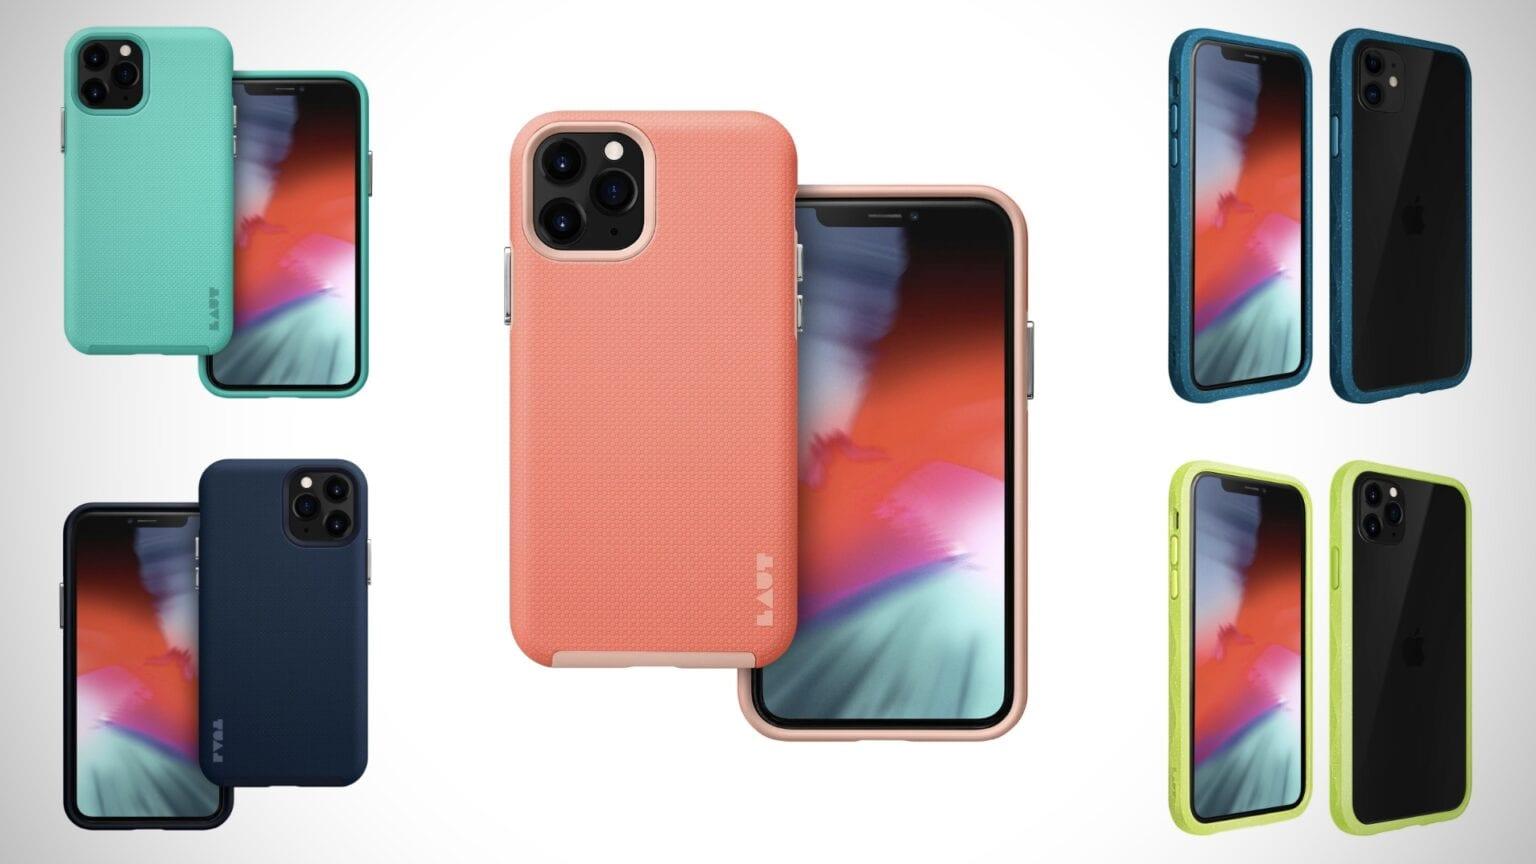 Laut colorful iPhone cases